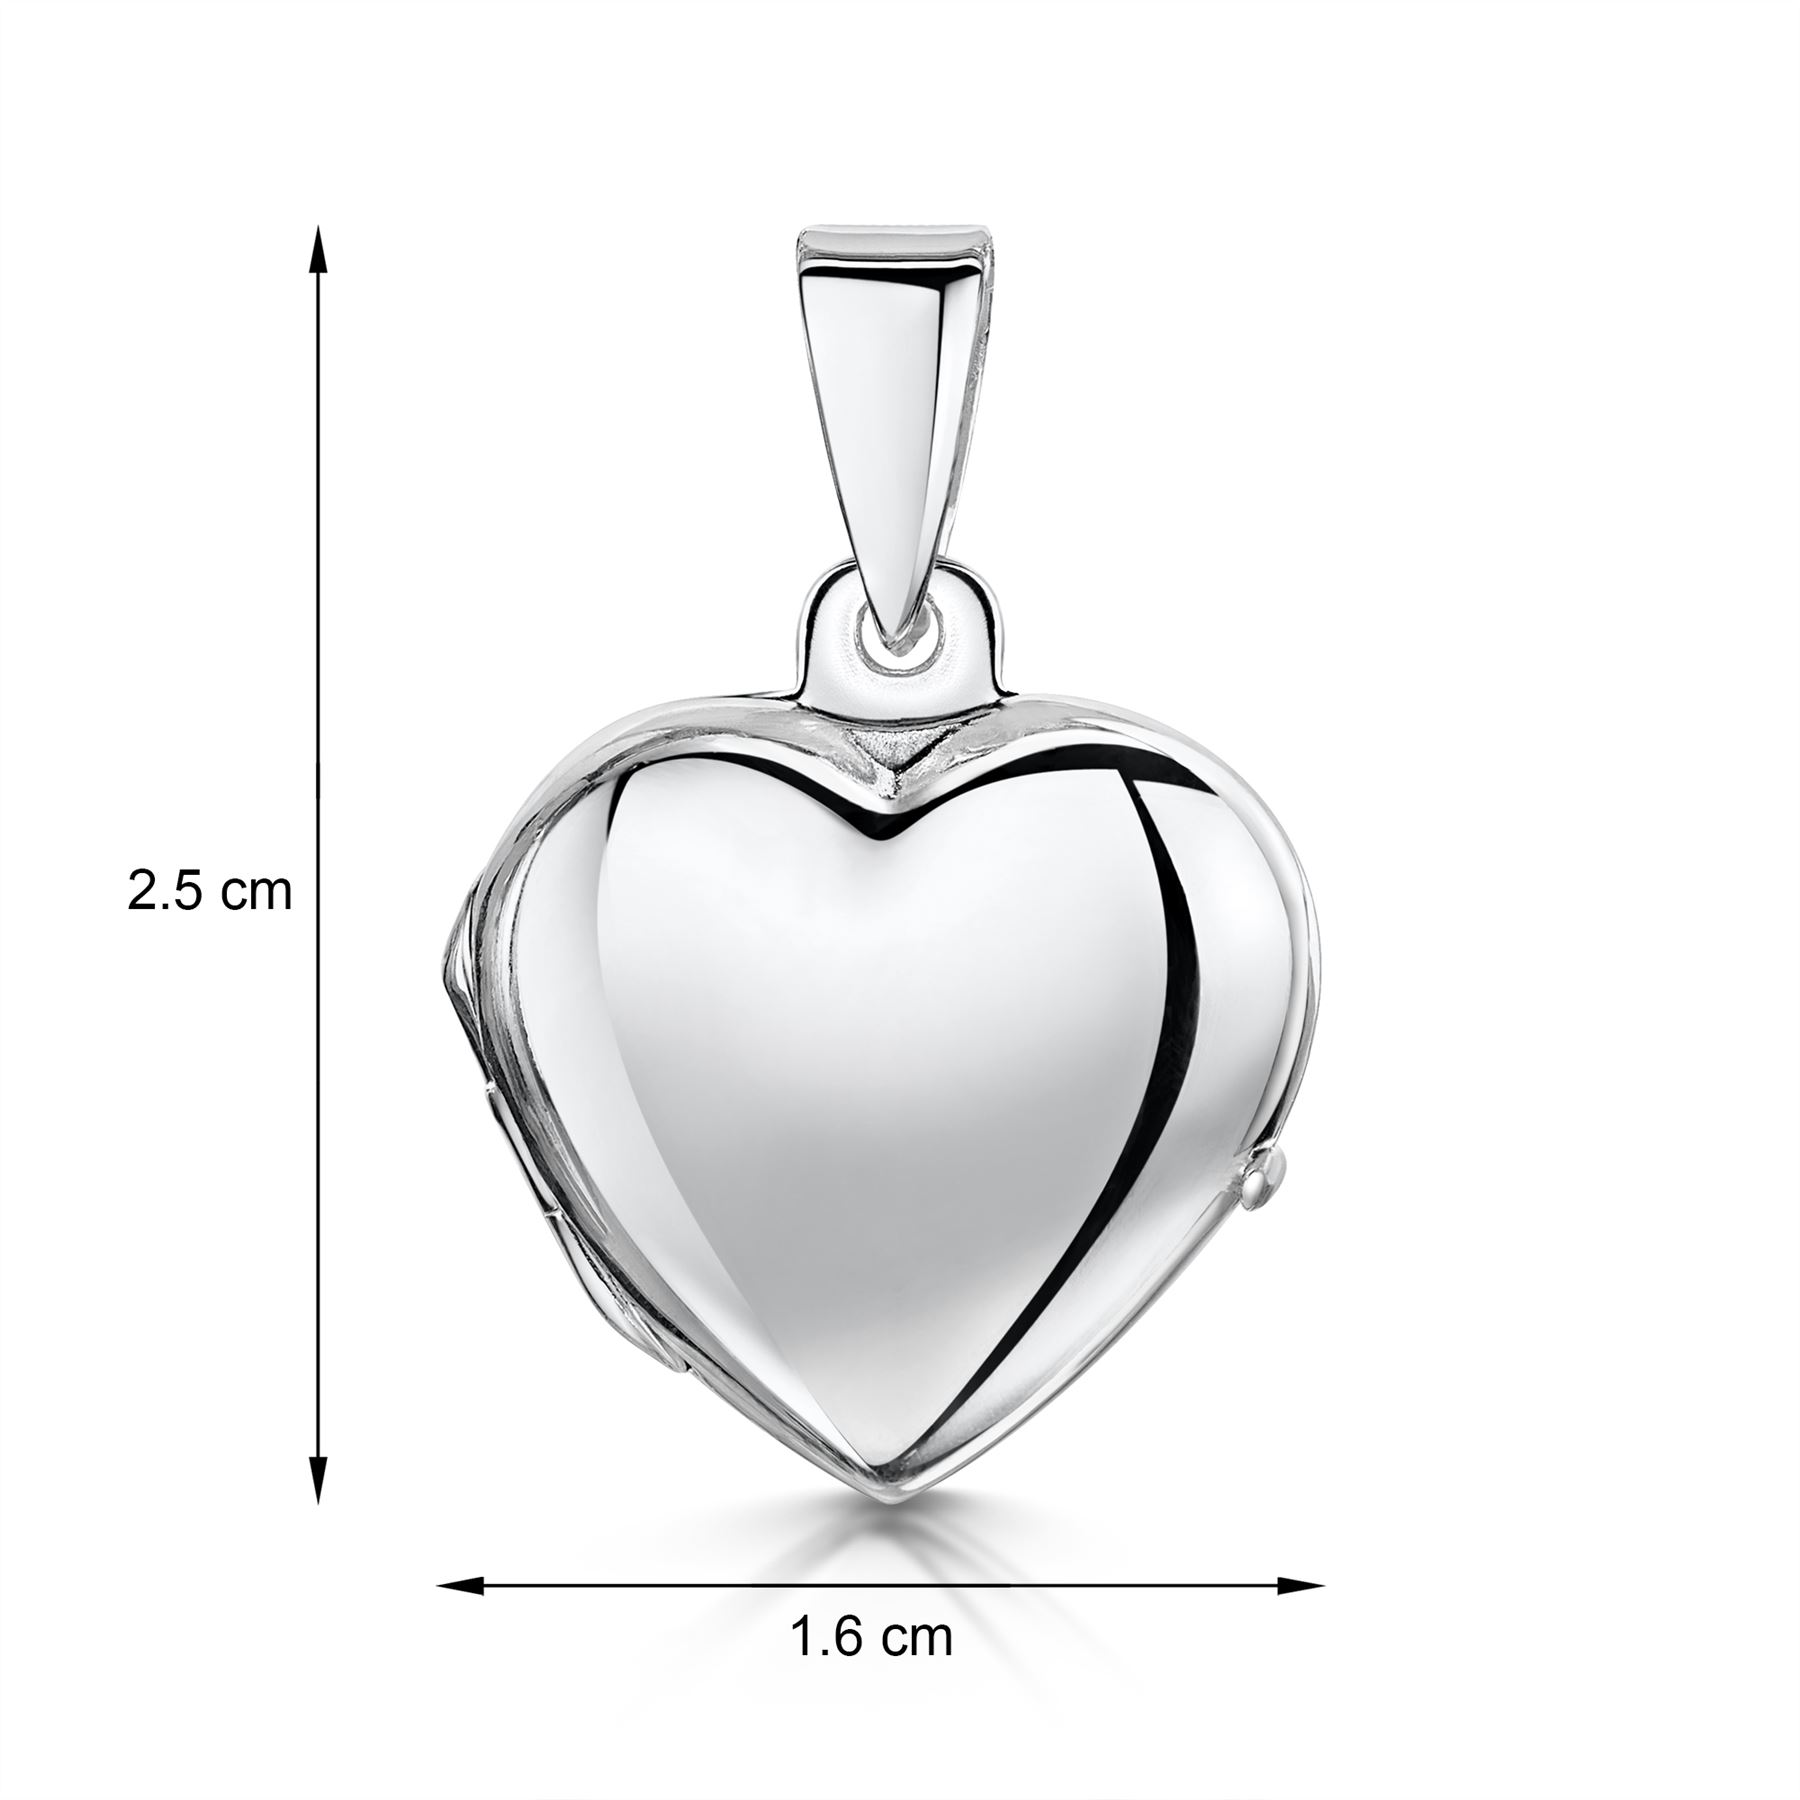 Amberta-Medallon-en-Fina-Plata-De-Ley-925-en-Formas-Diferentes-Para-Foto-y-Gemas miniatura 16